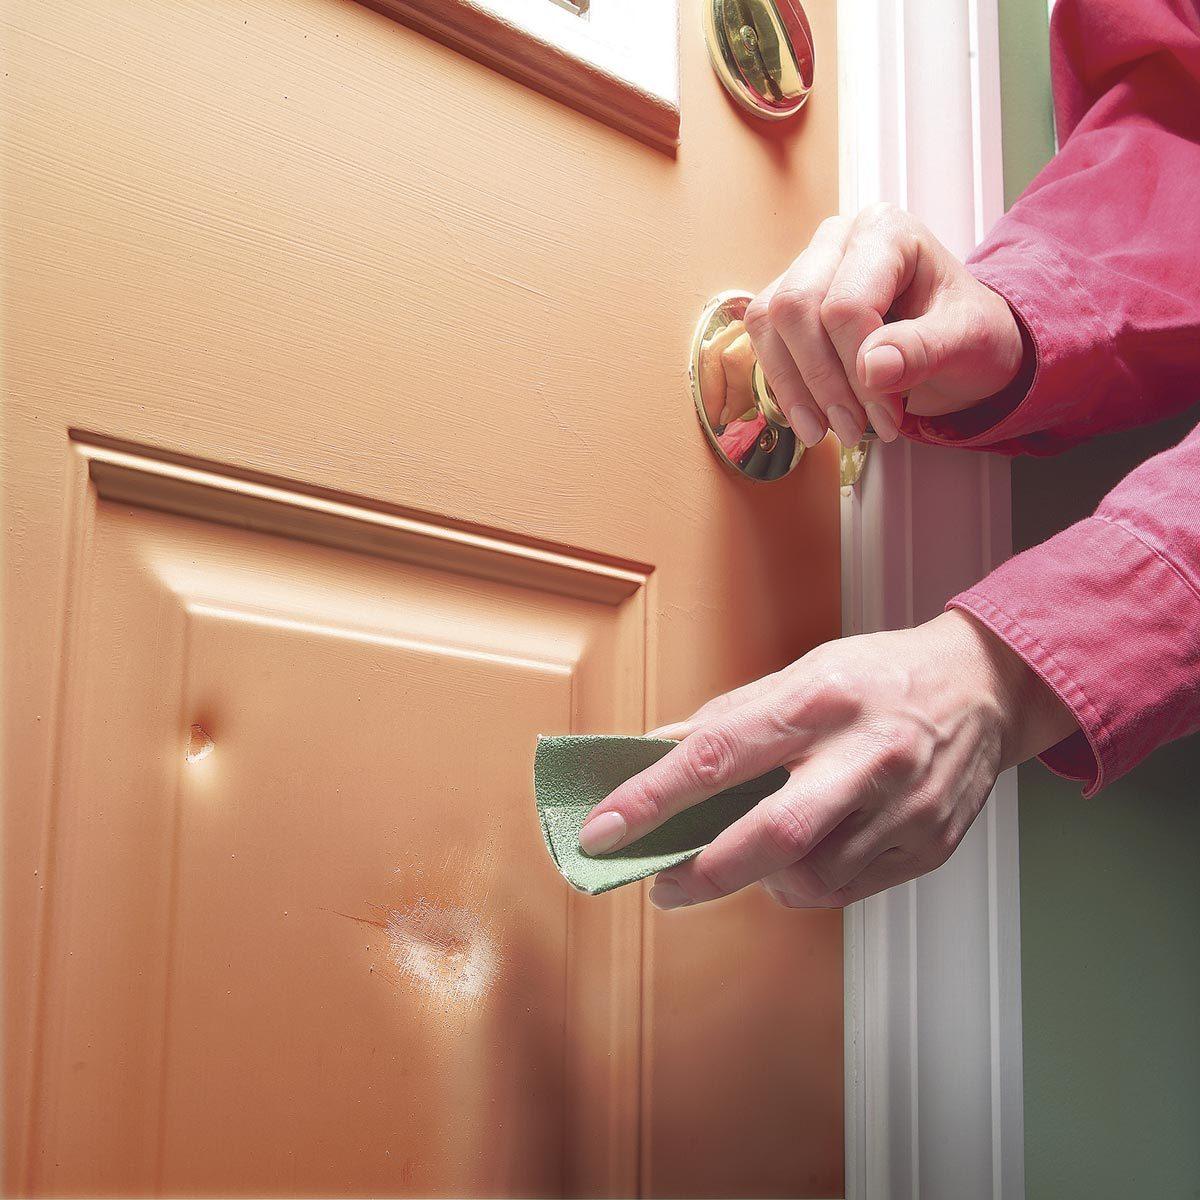 Patch Dents in a Metal Door | Family Handyman